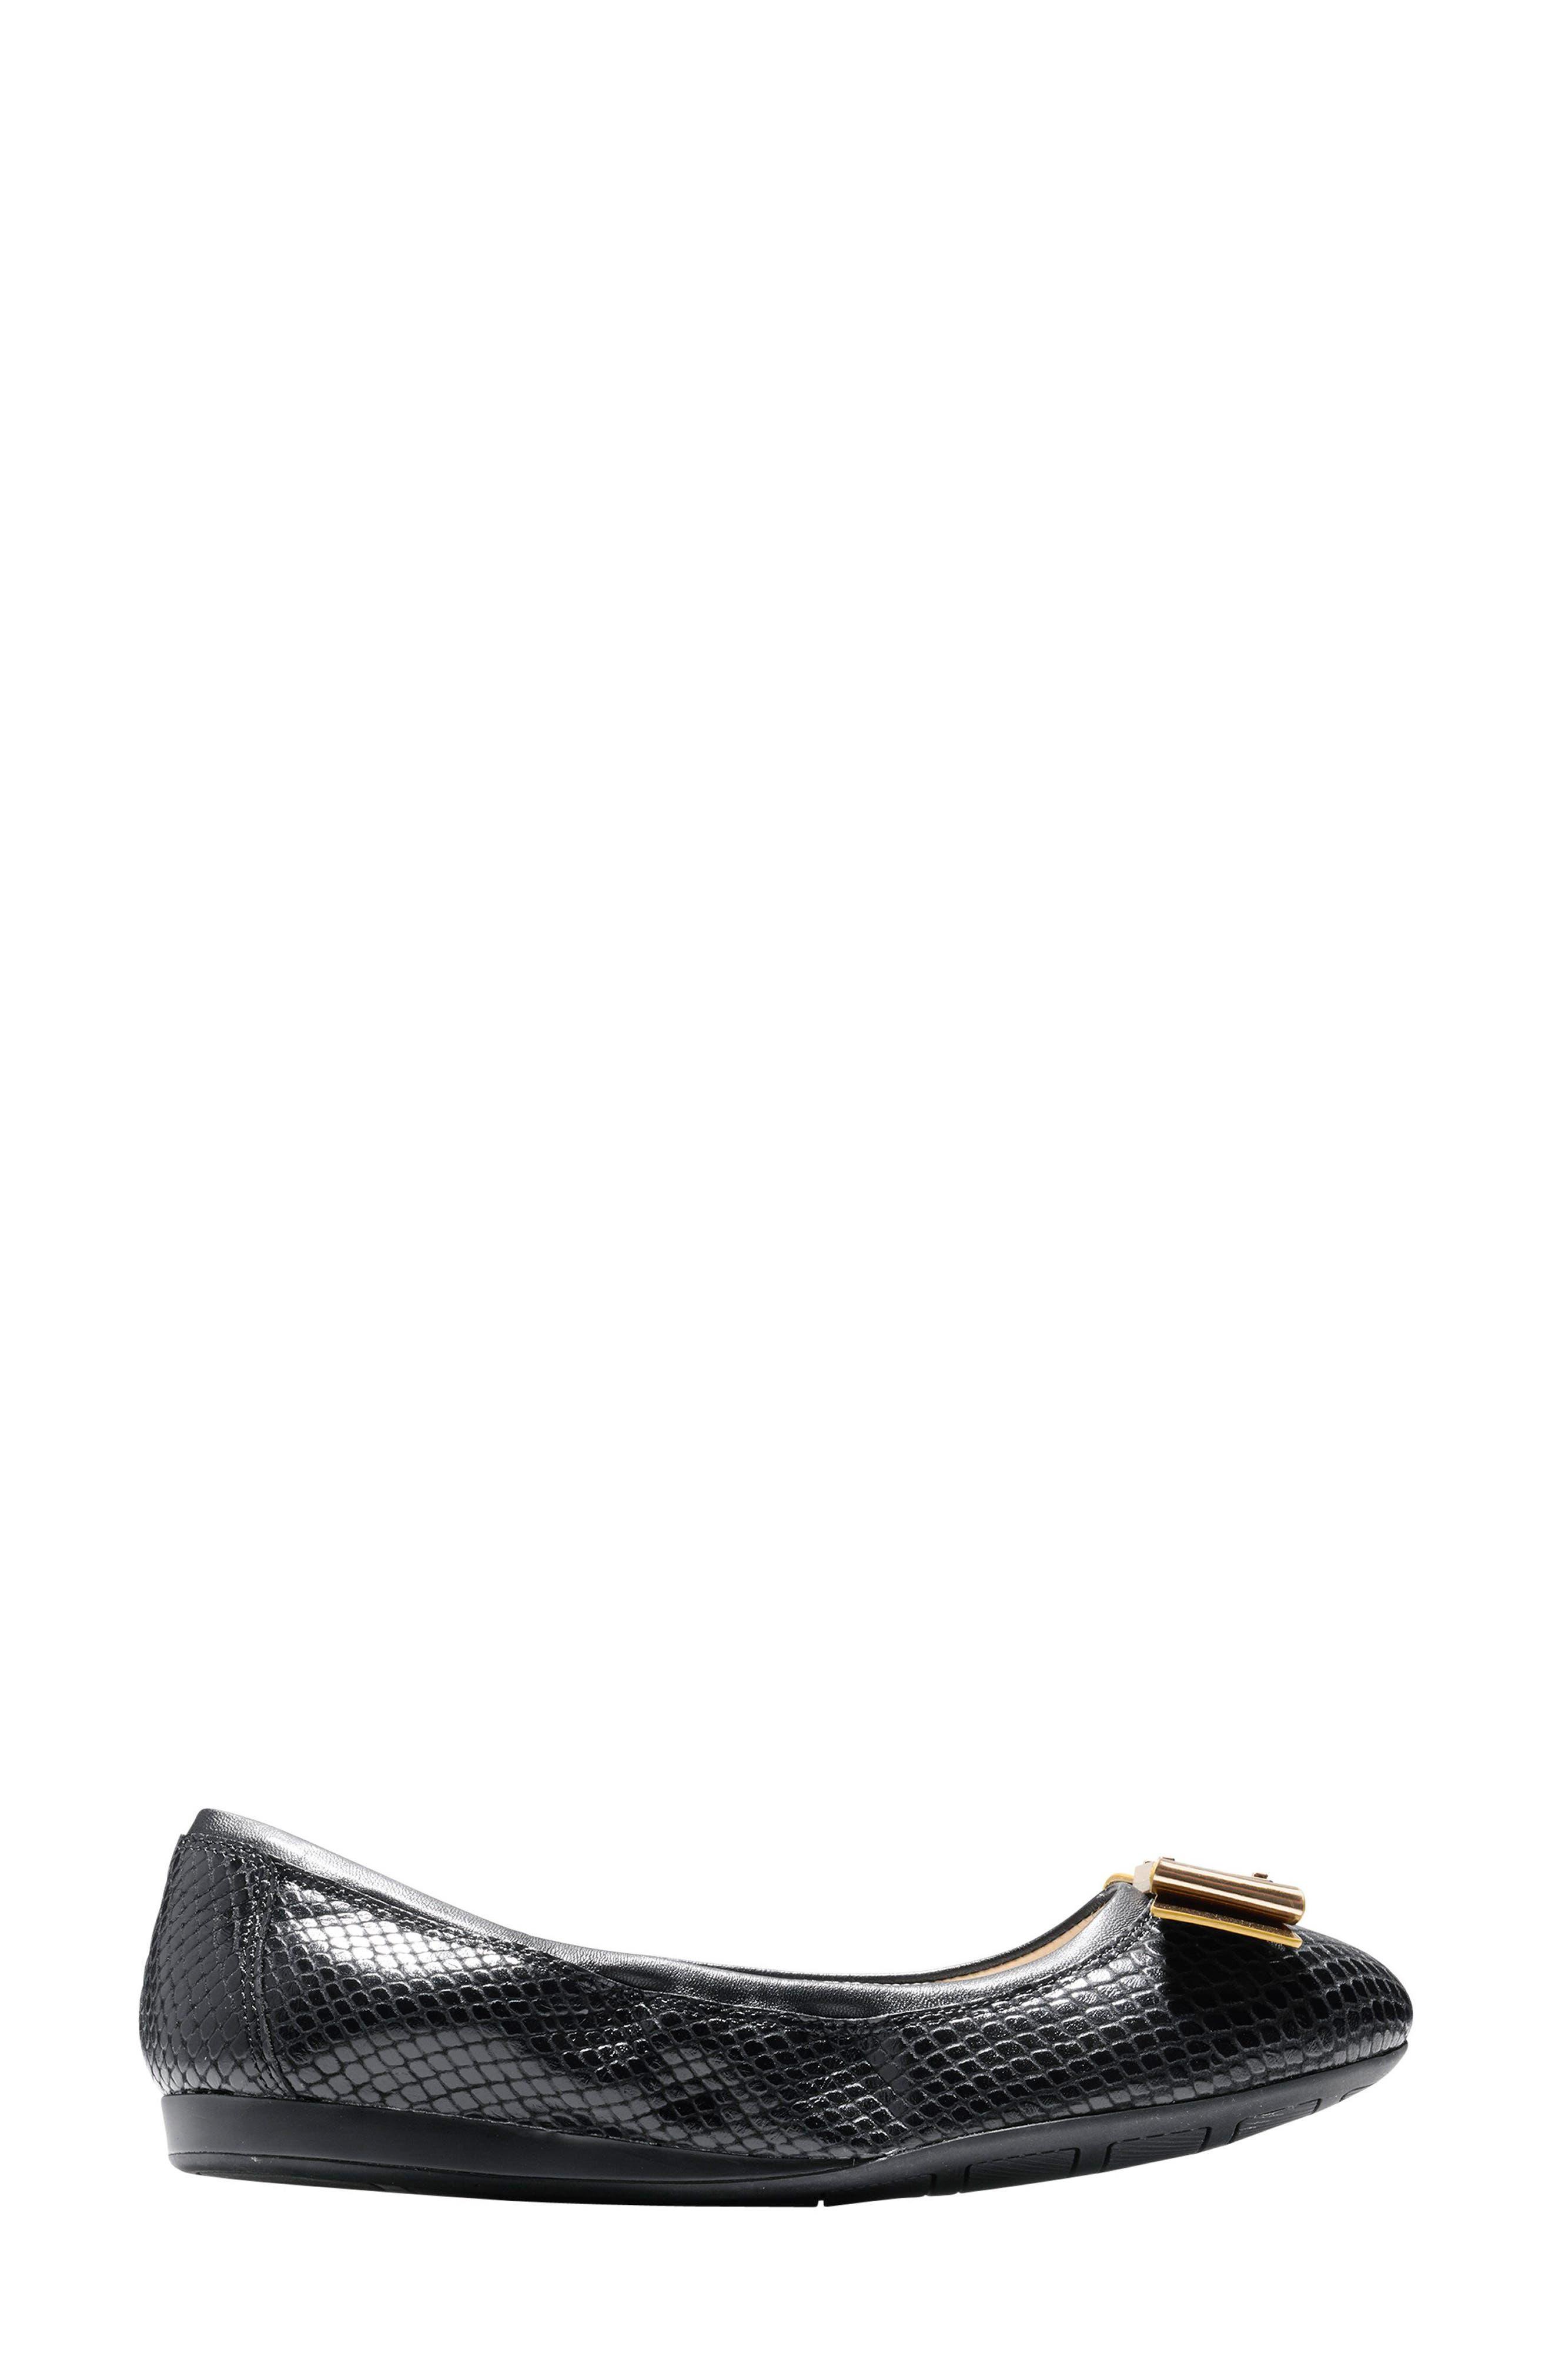 'Tali' Bow Ballet Flat,                             Alternate thumbnail 3, color,                             Black Snake Print Leather